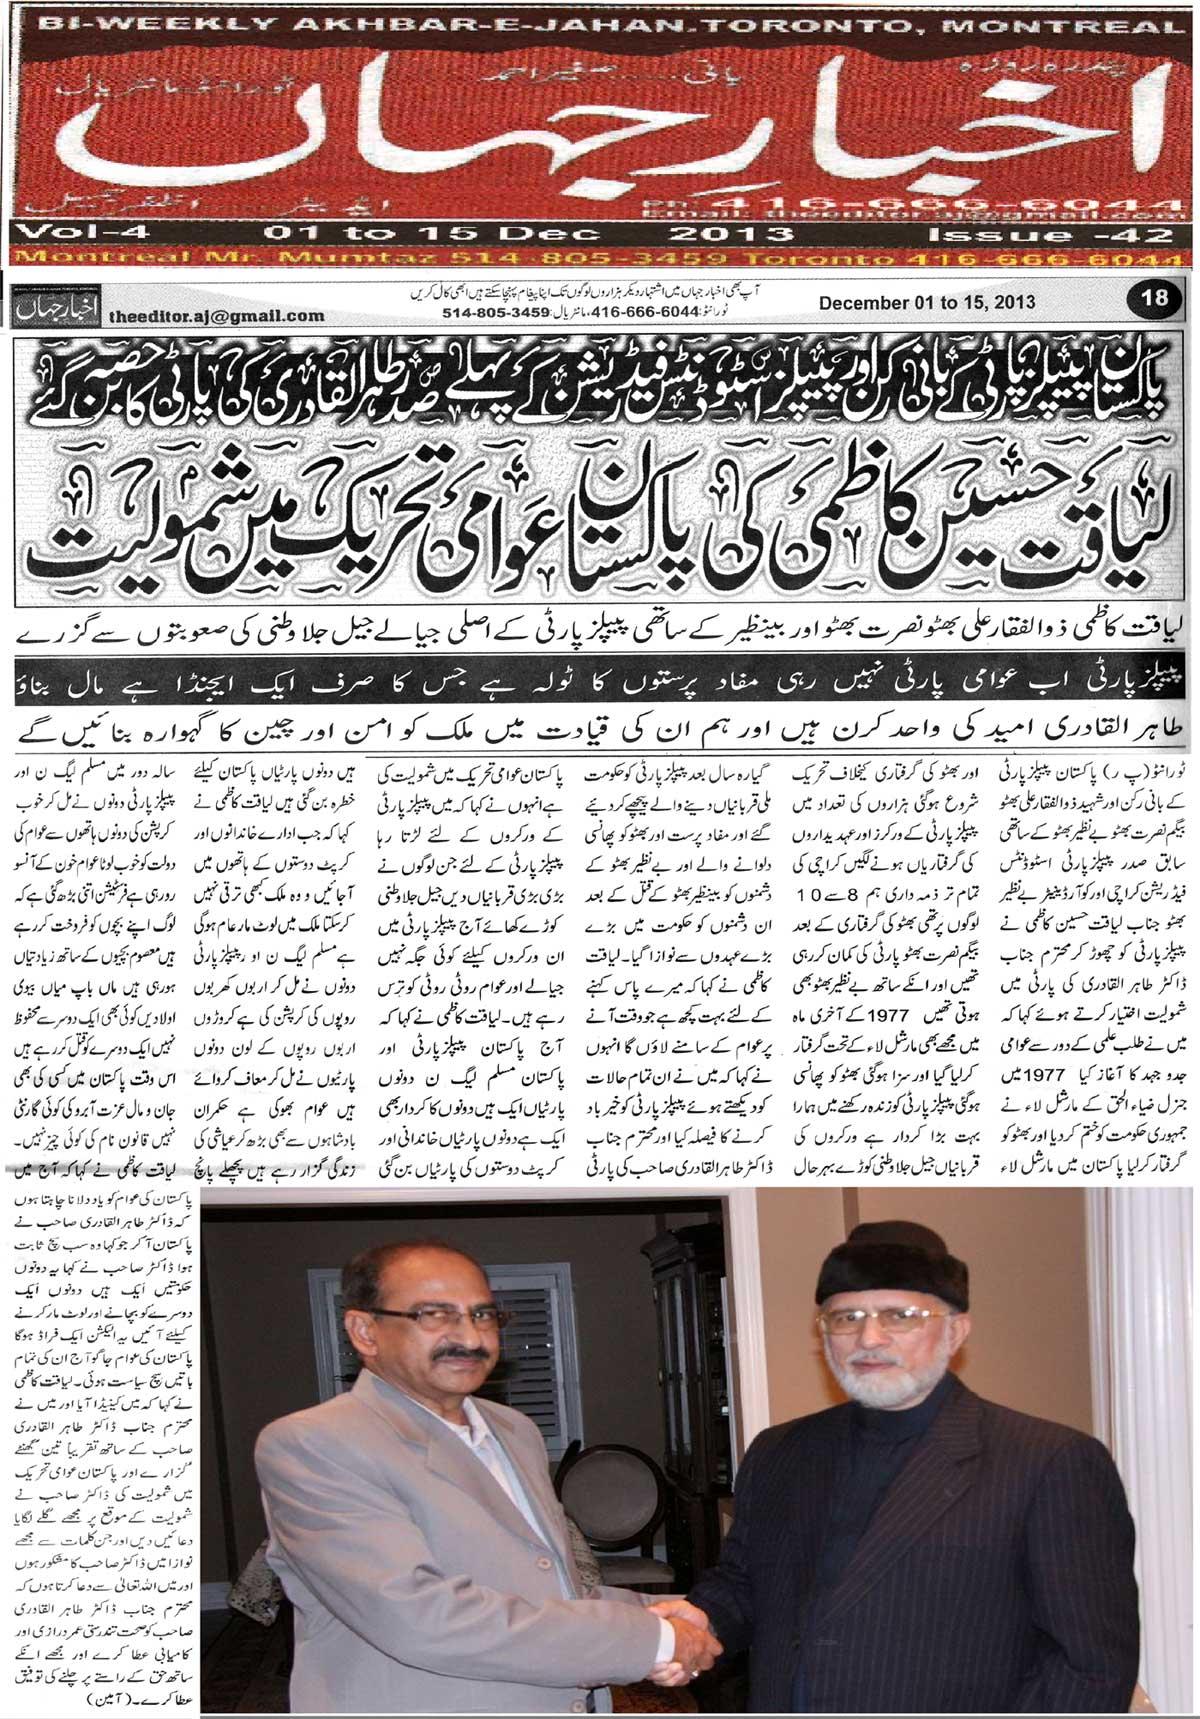 Mustafavi Student Movement Print Media Coverage Weekly Akhbar e Jahan Toronto